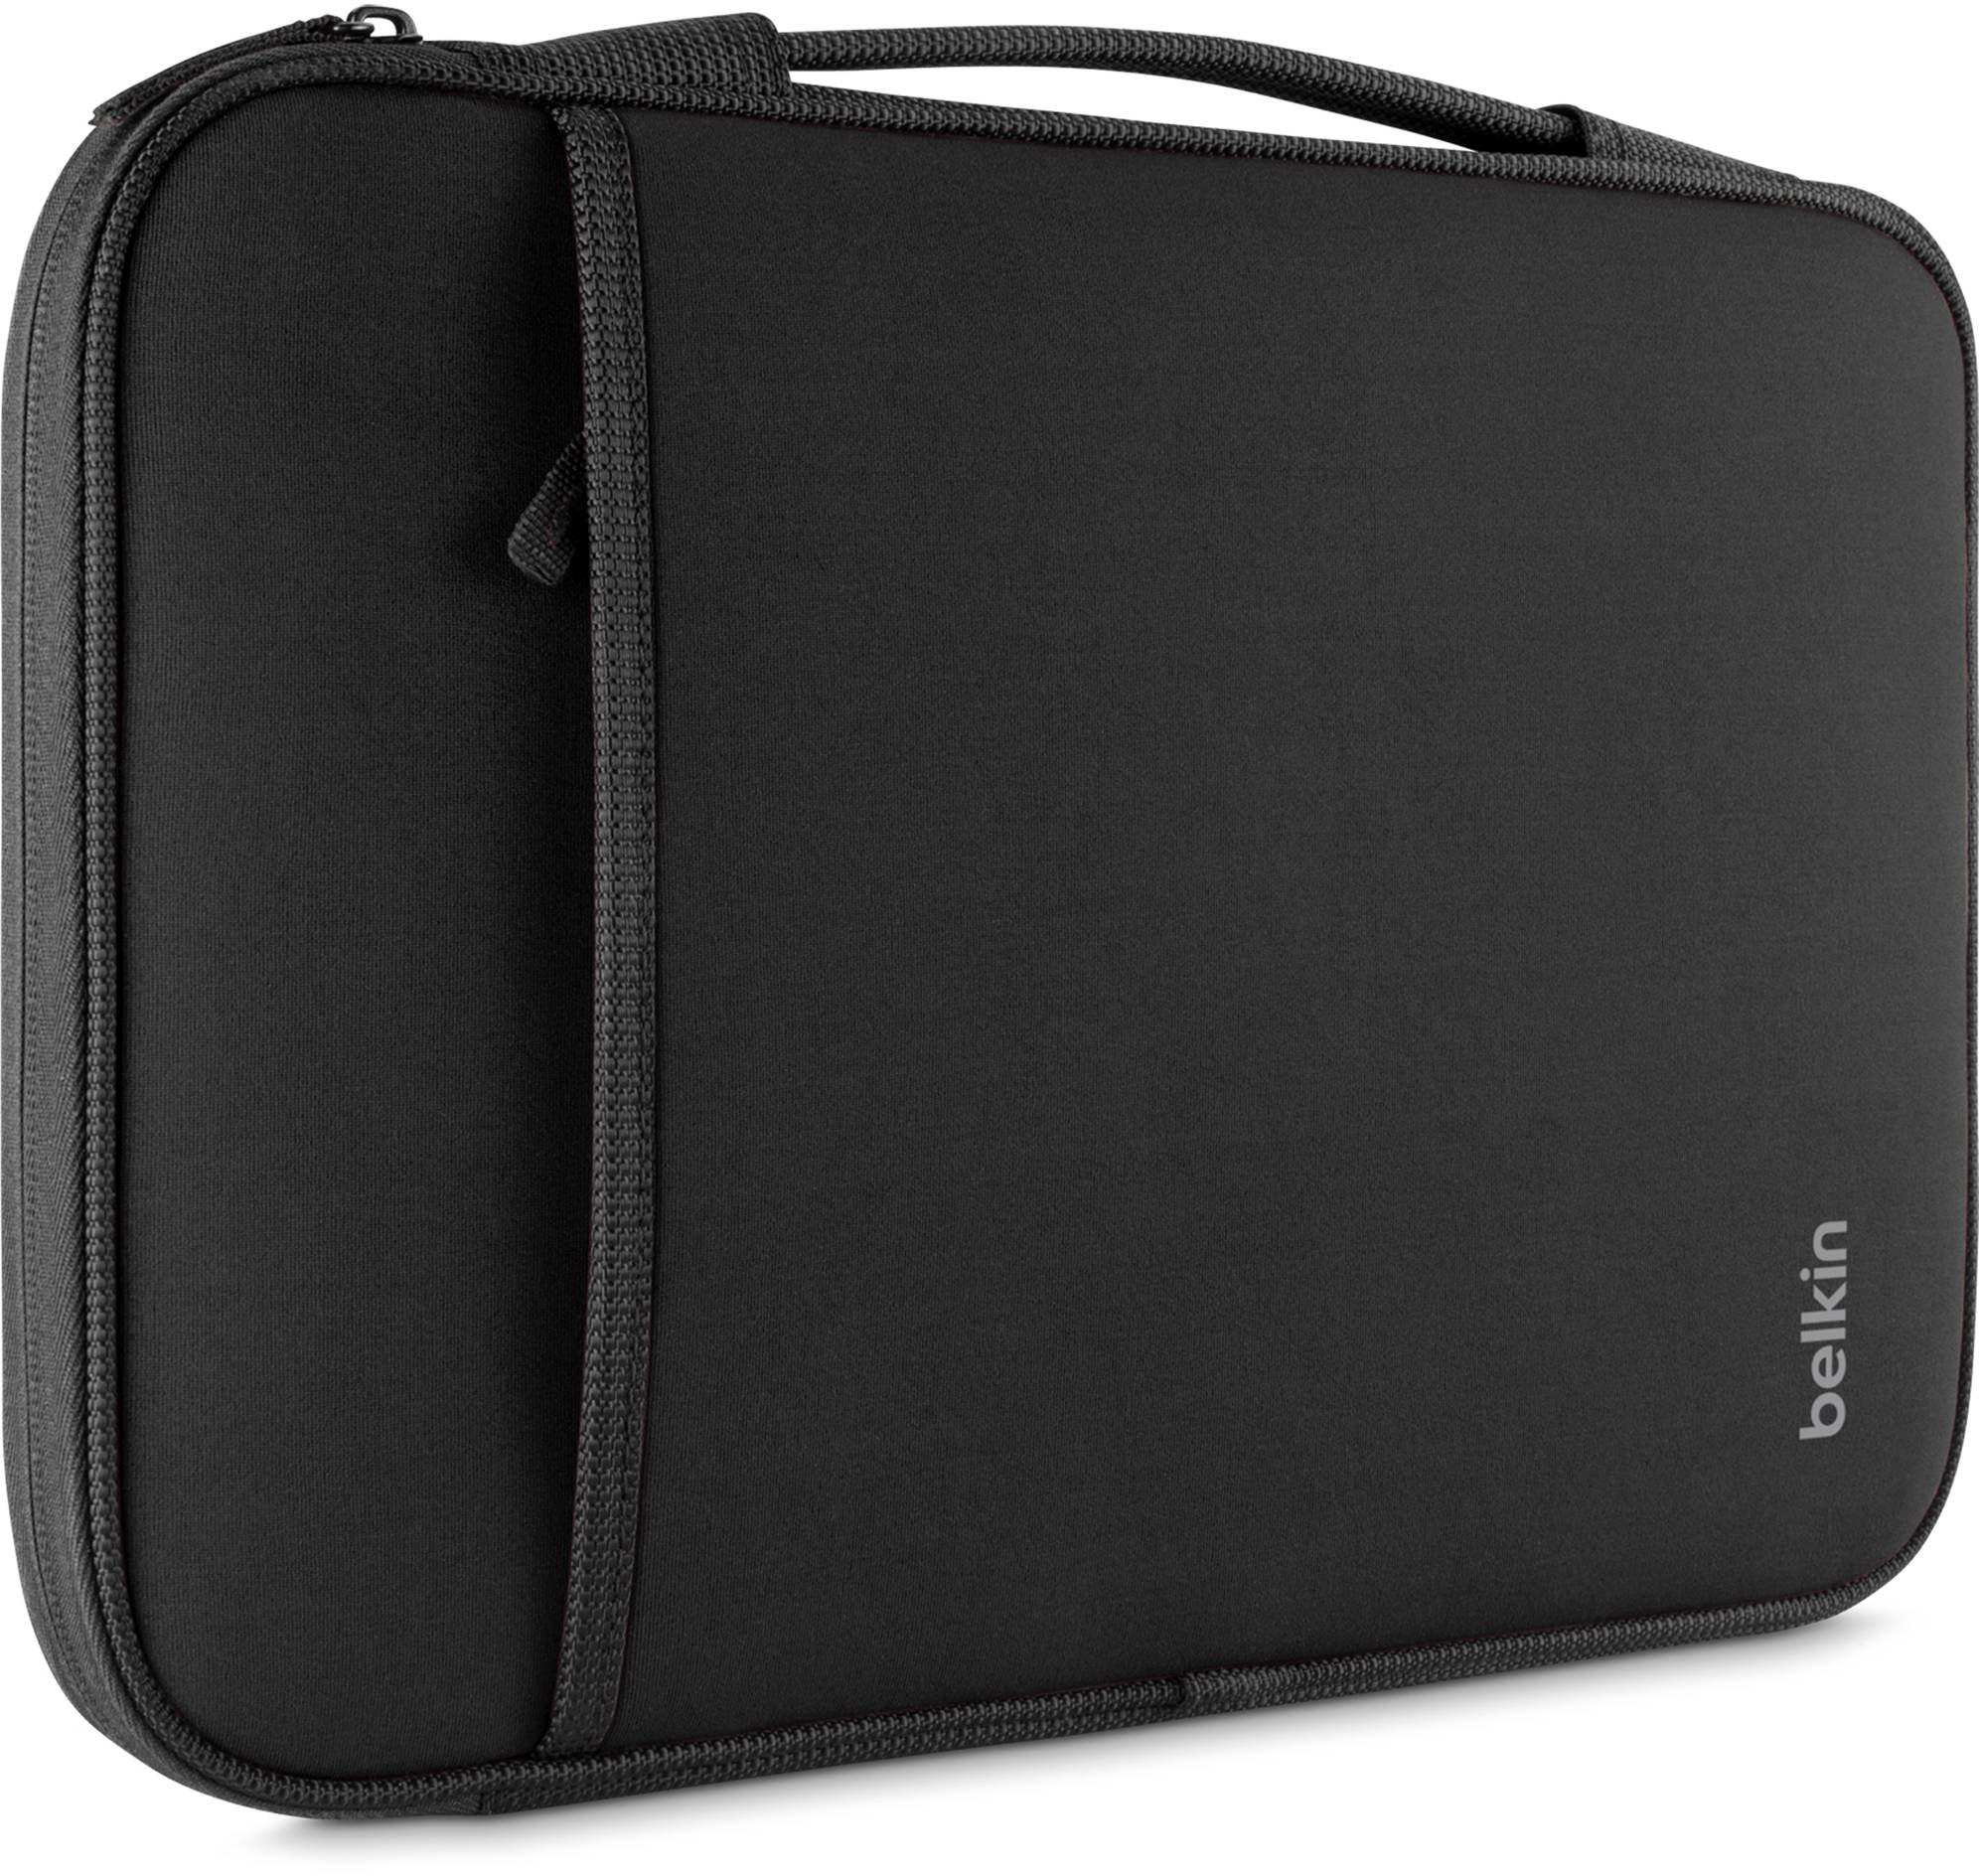 "Belkin Cover/Sleeve (B2B075-C00) - сумка для ноутбука 14"" (Black)"